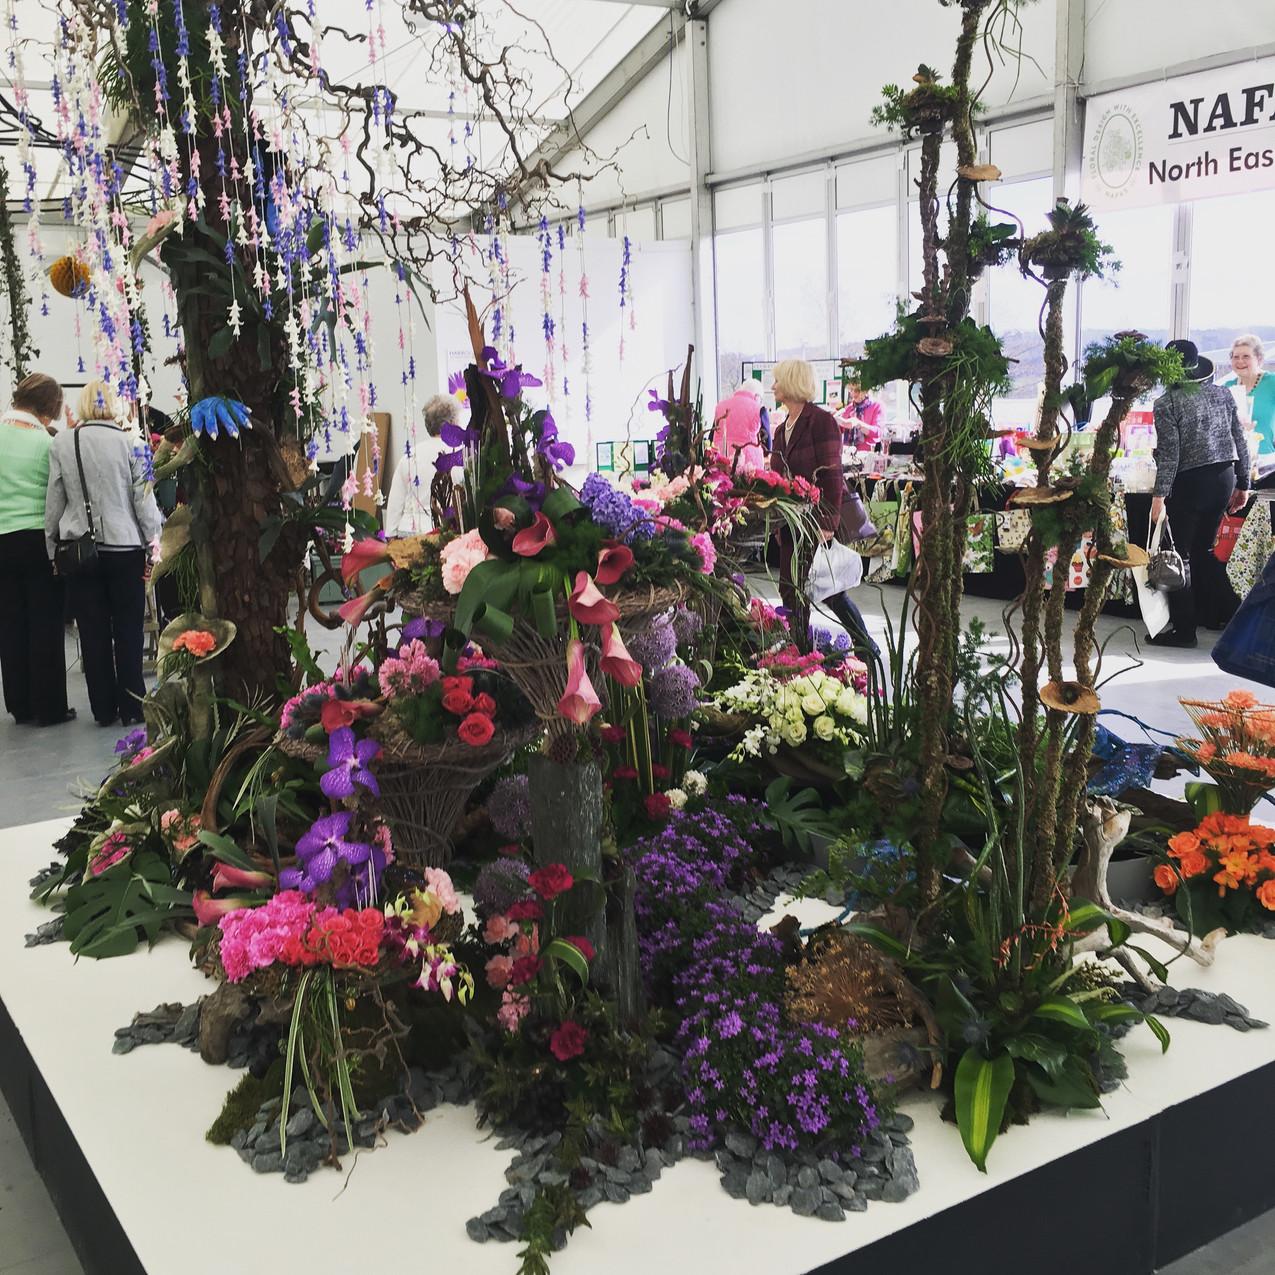 Floral display in Floral Art Marquee